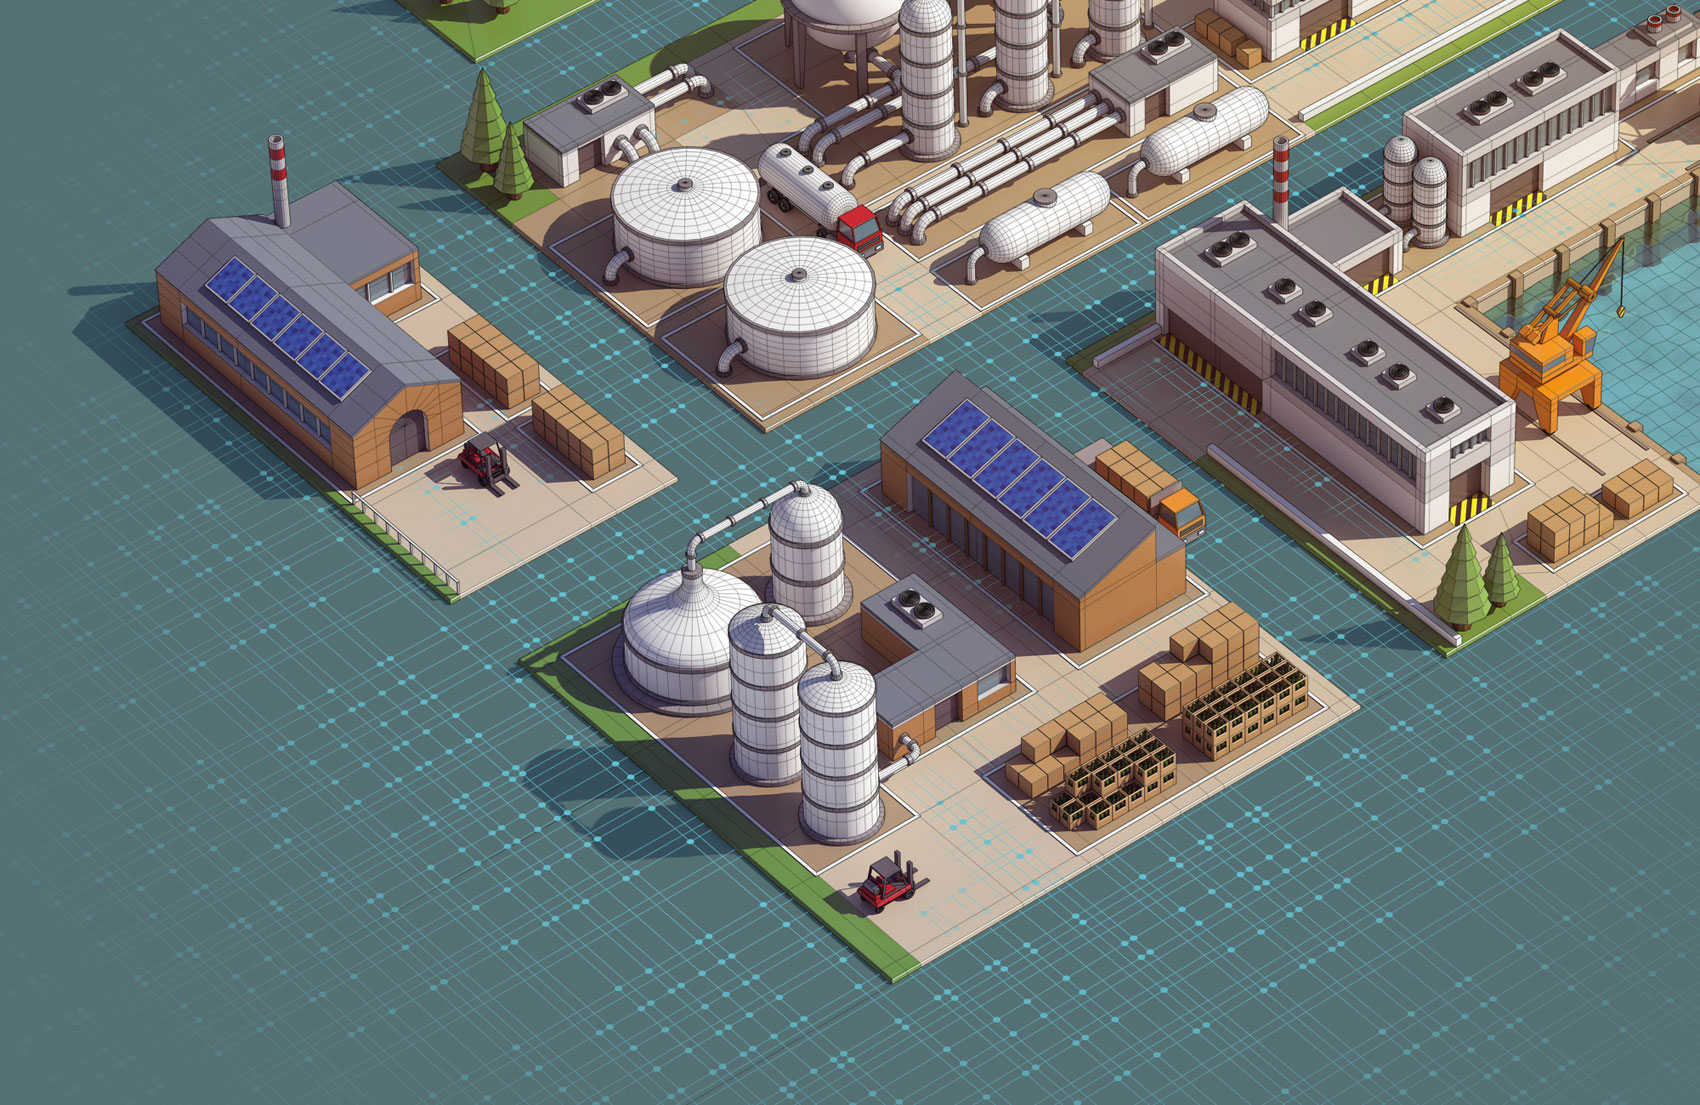 socomec-industrie-agoalimentaire-04B